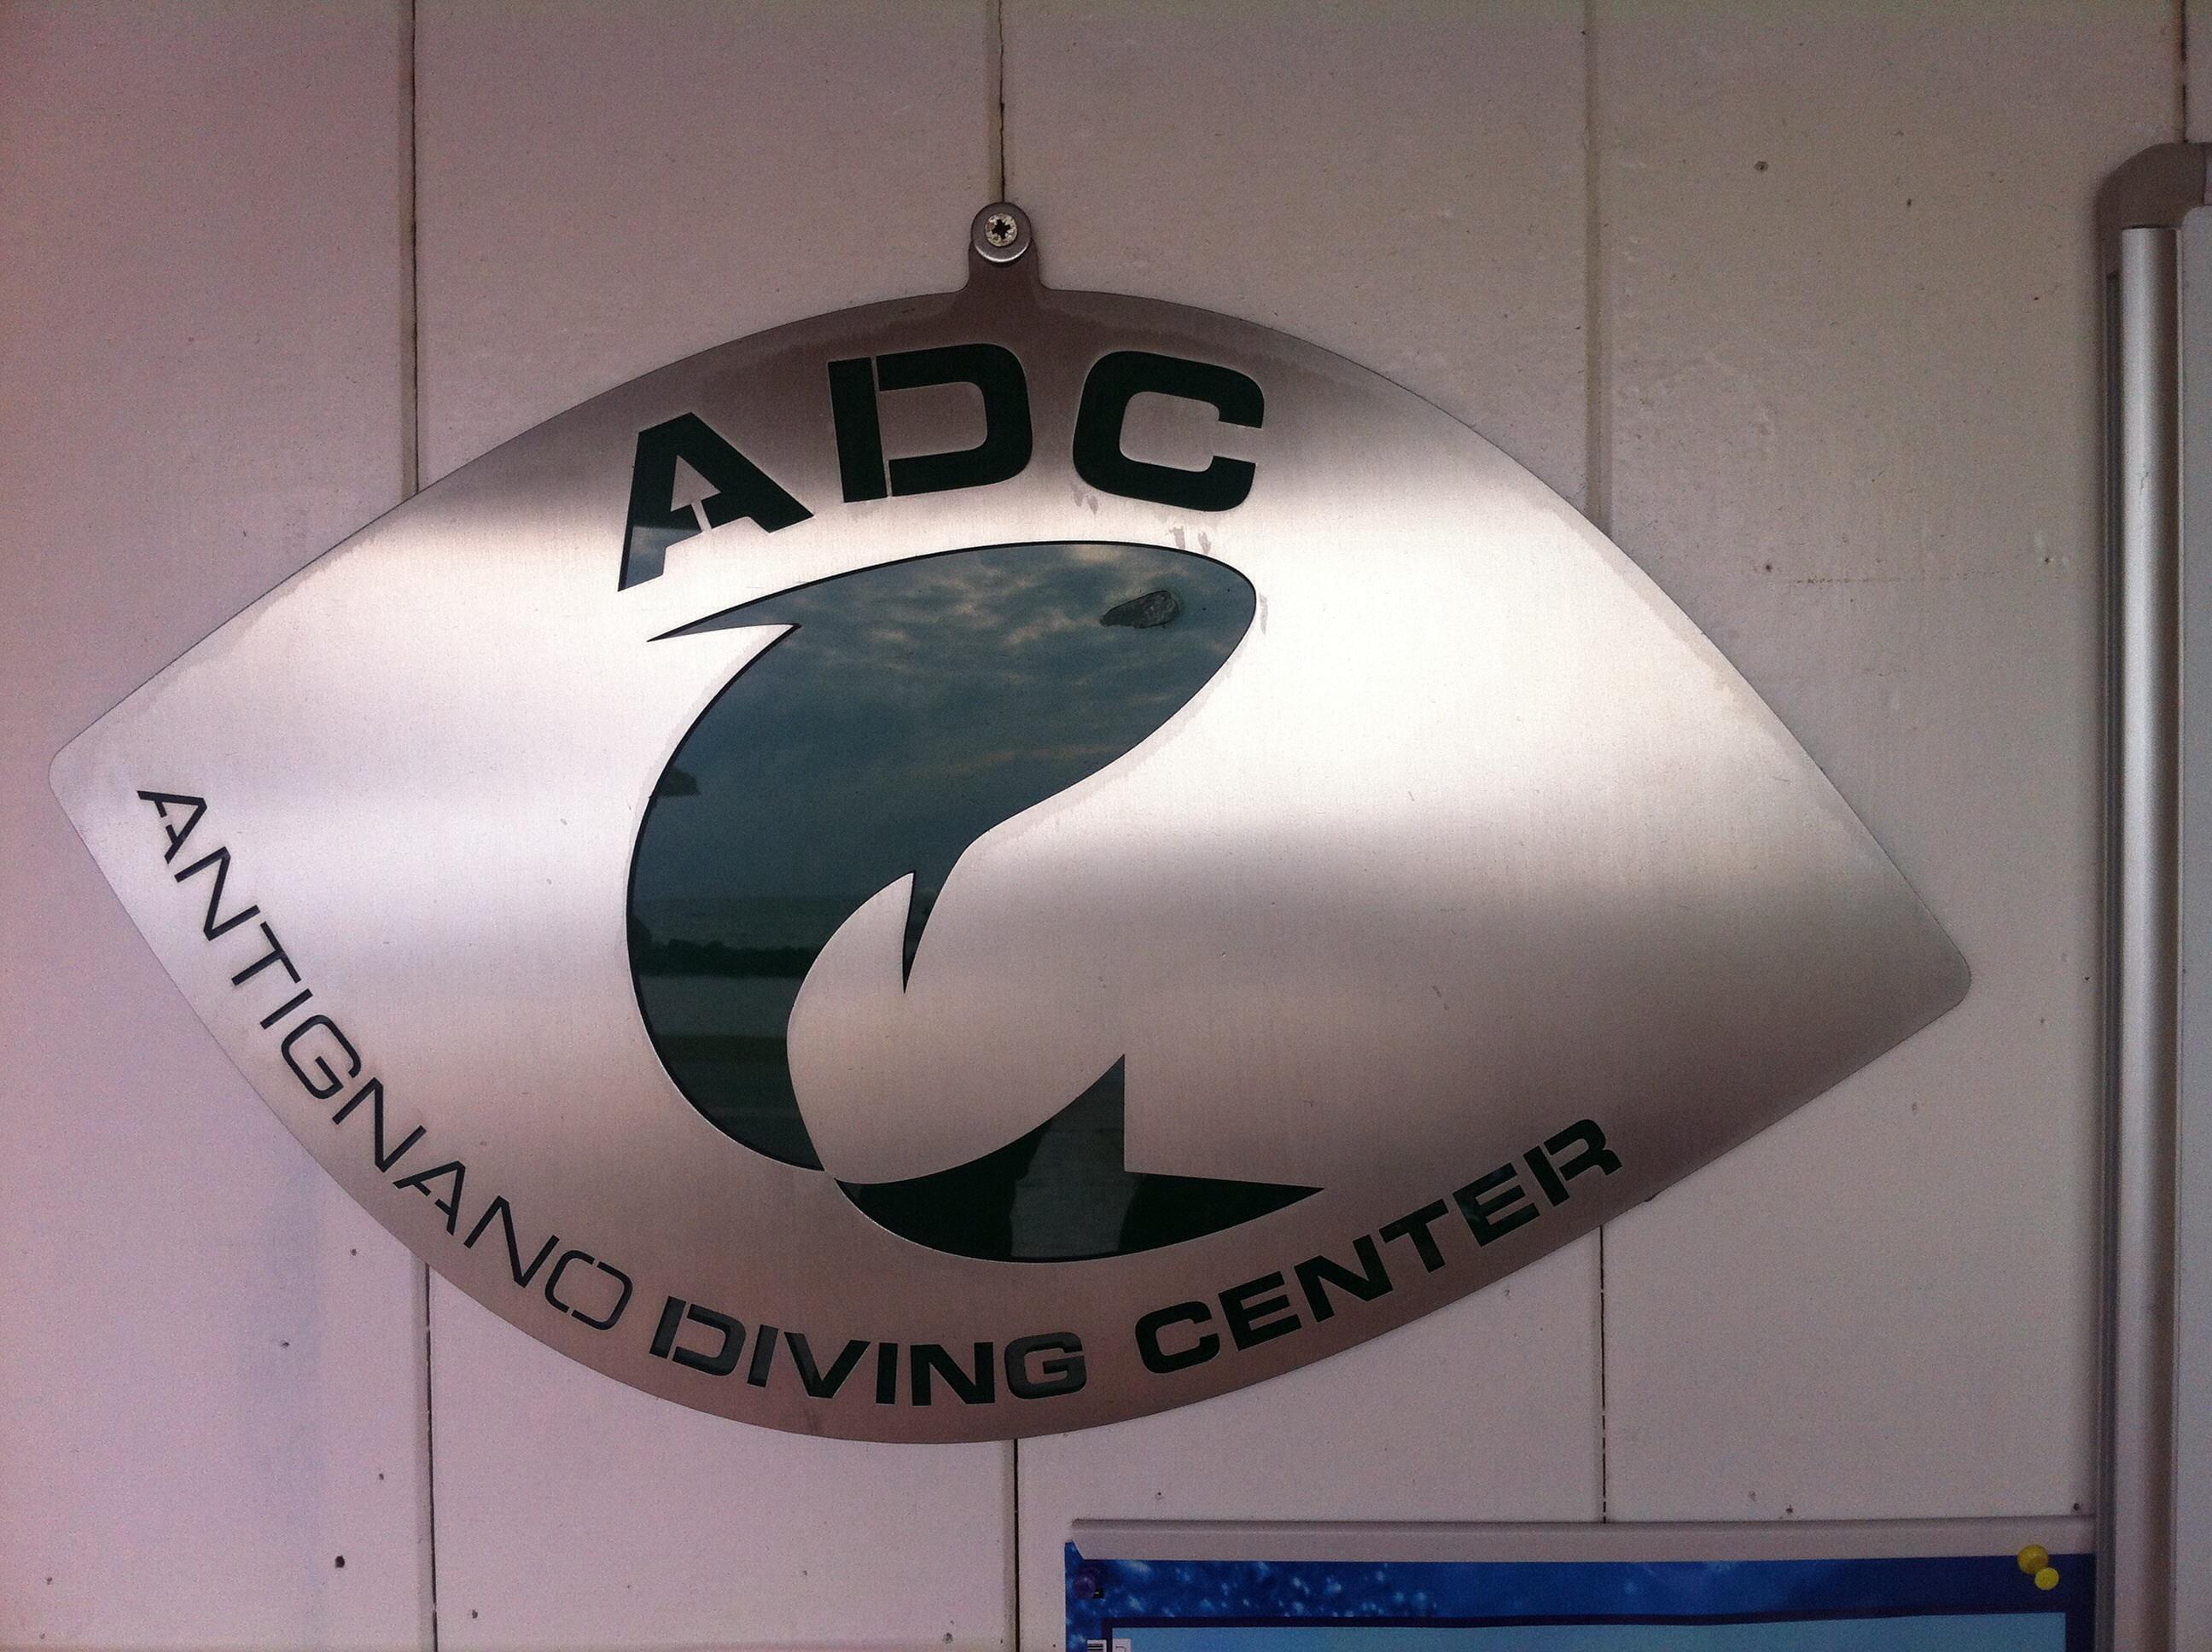 Antignano Diving Center